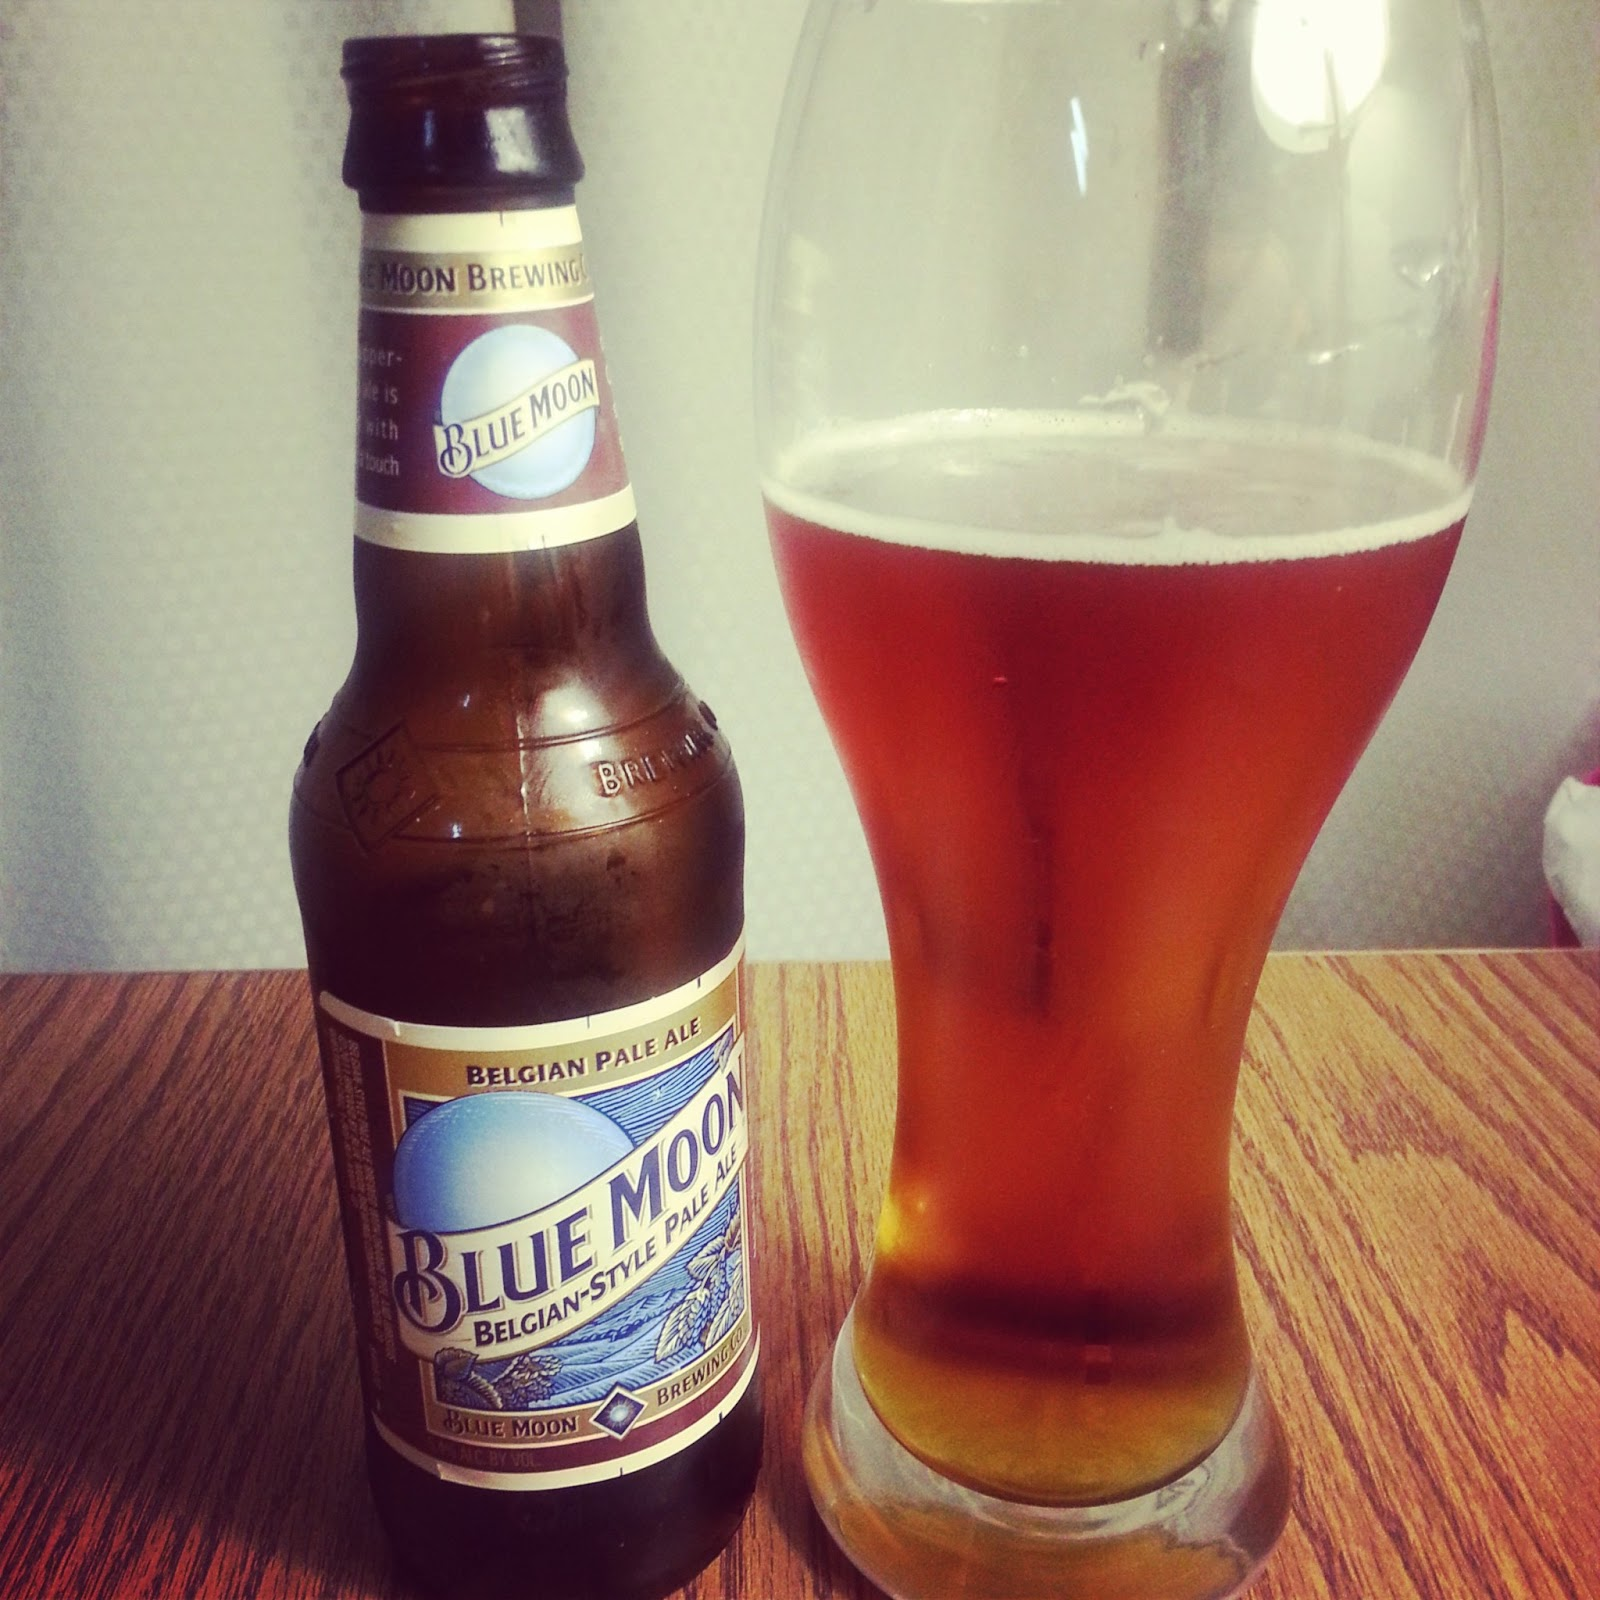 Beer moon